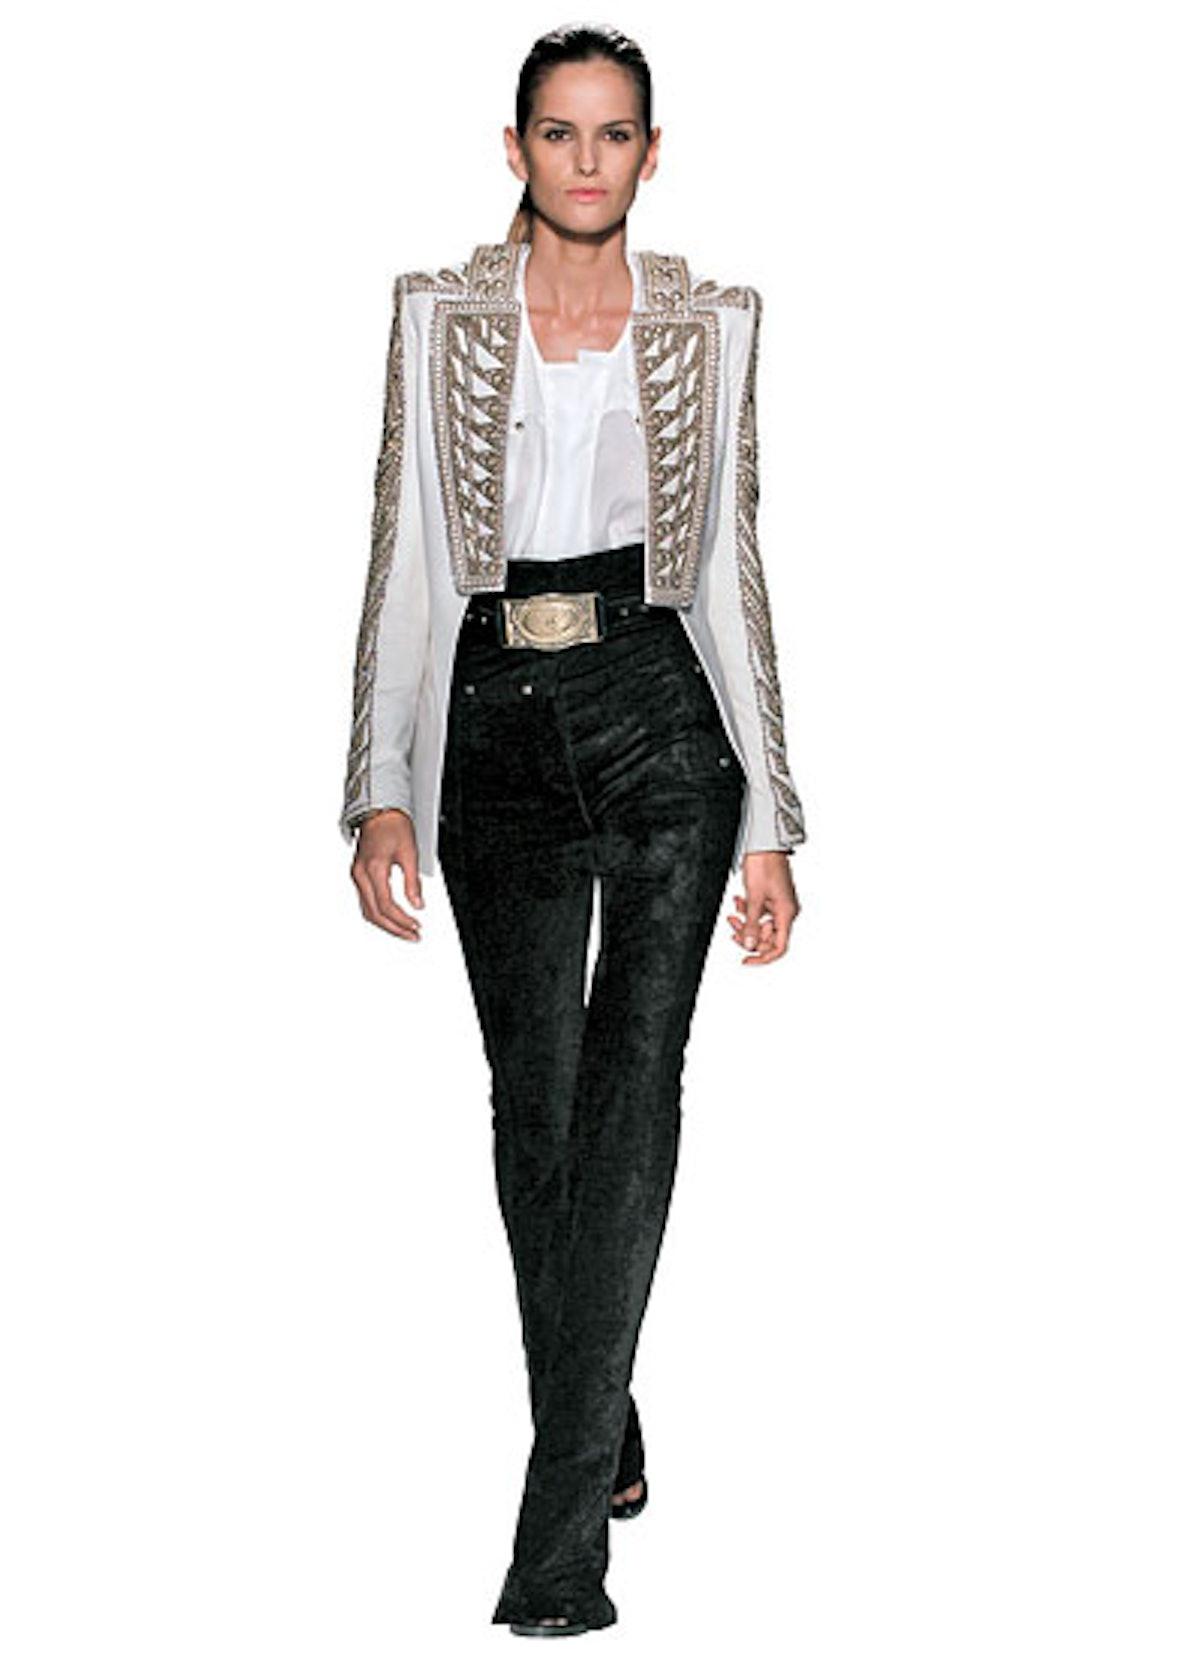 fass-international-style-trends-04-v.jpg